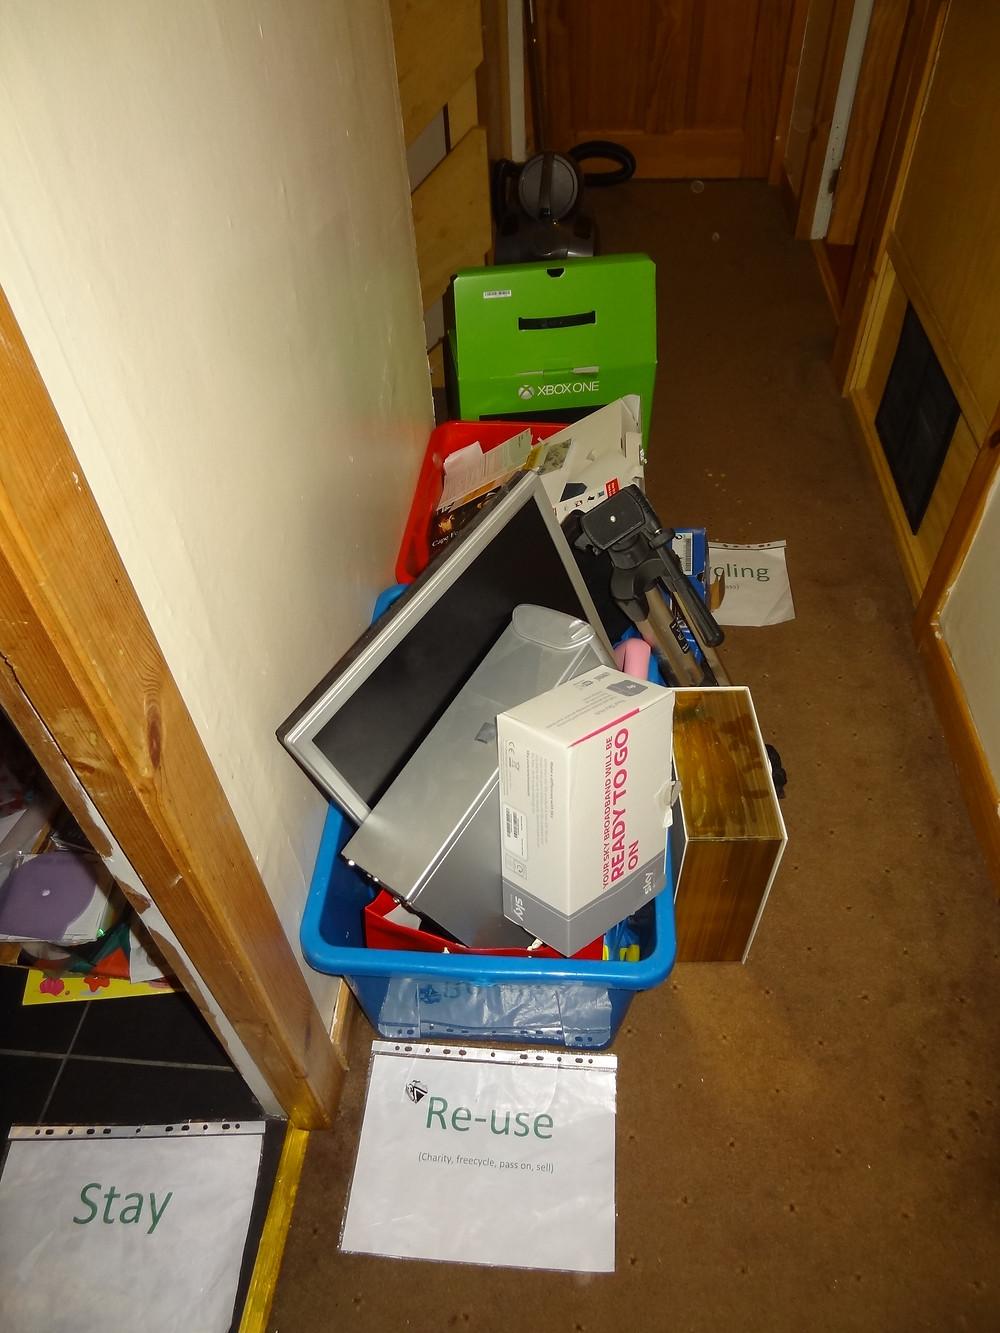 Organising piles